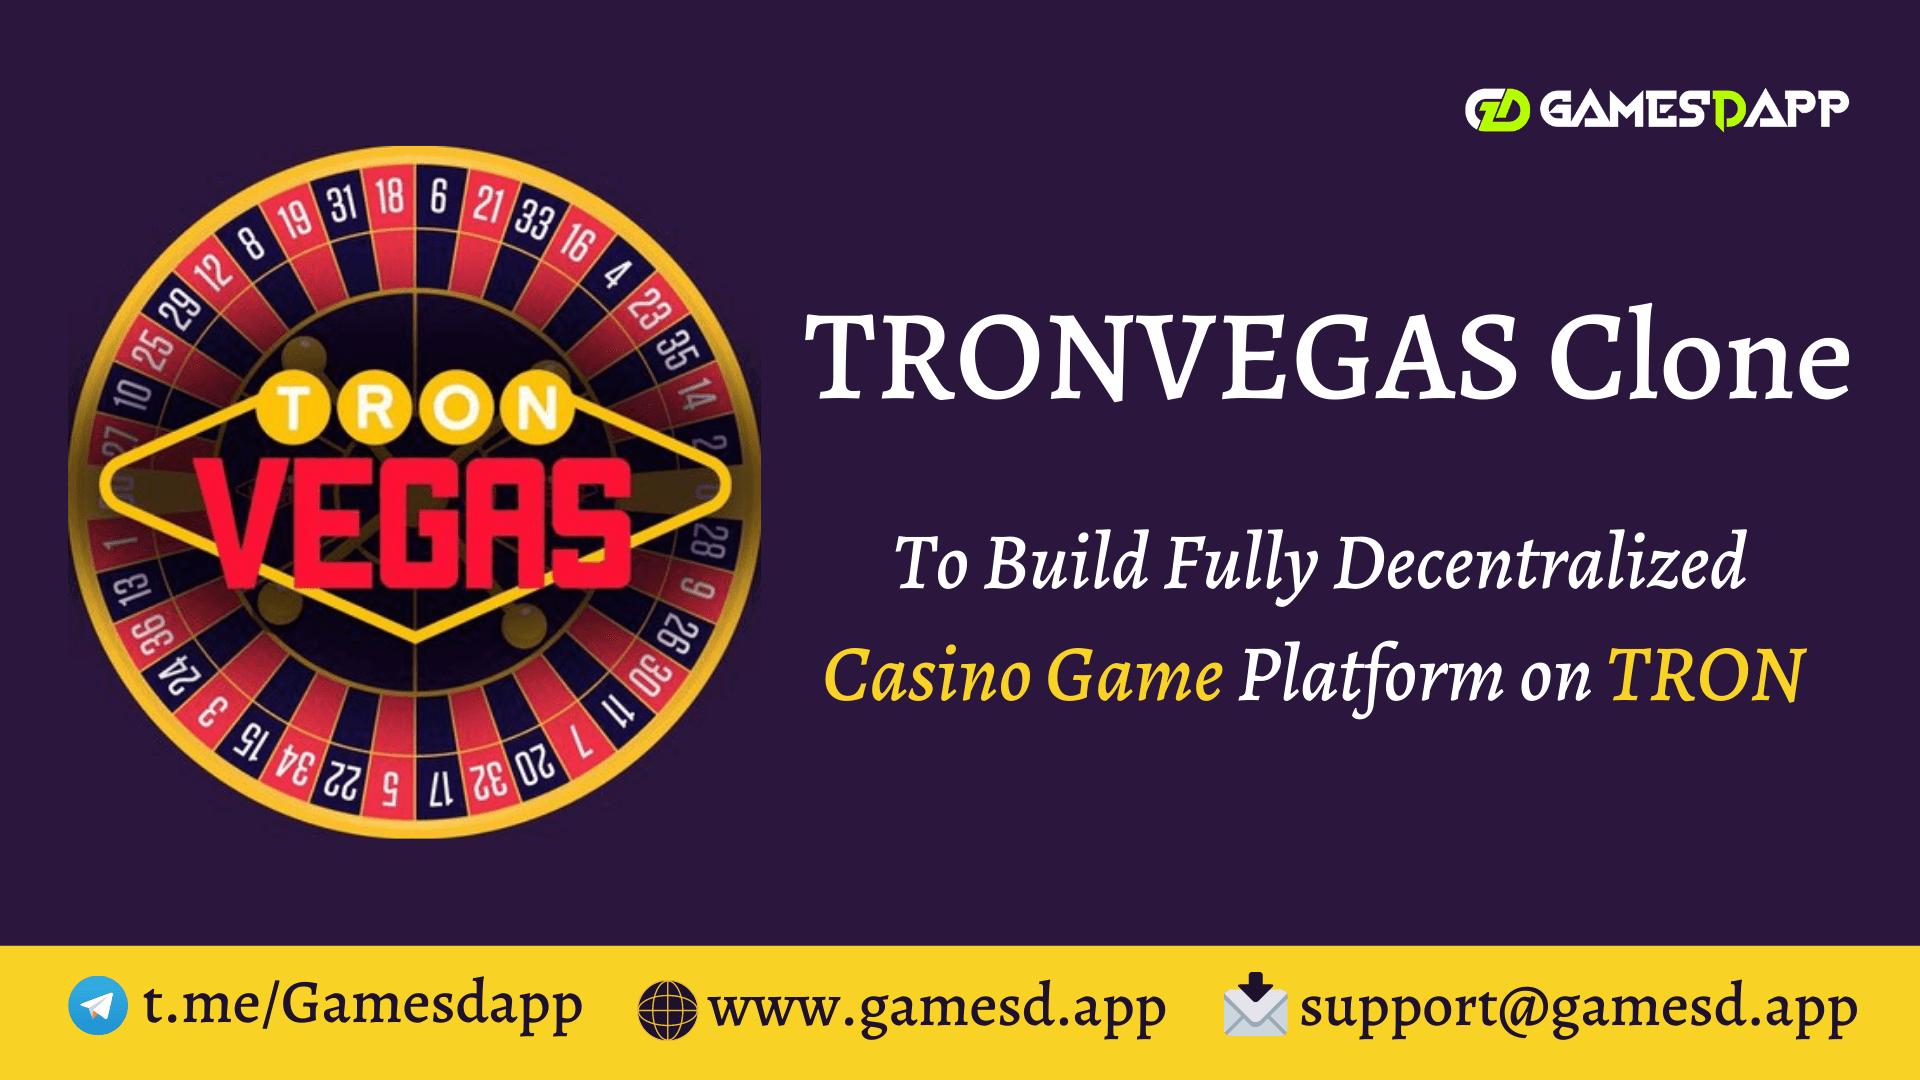 TRONVegas Clone - To Create Fully Decentralized Casino Game Platform on TRON Blockchain